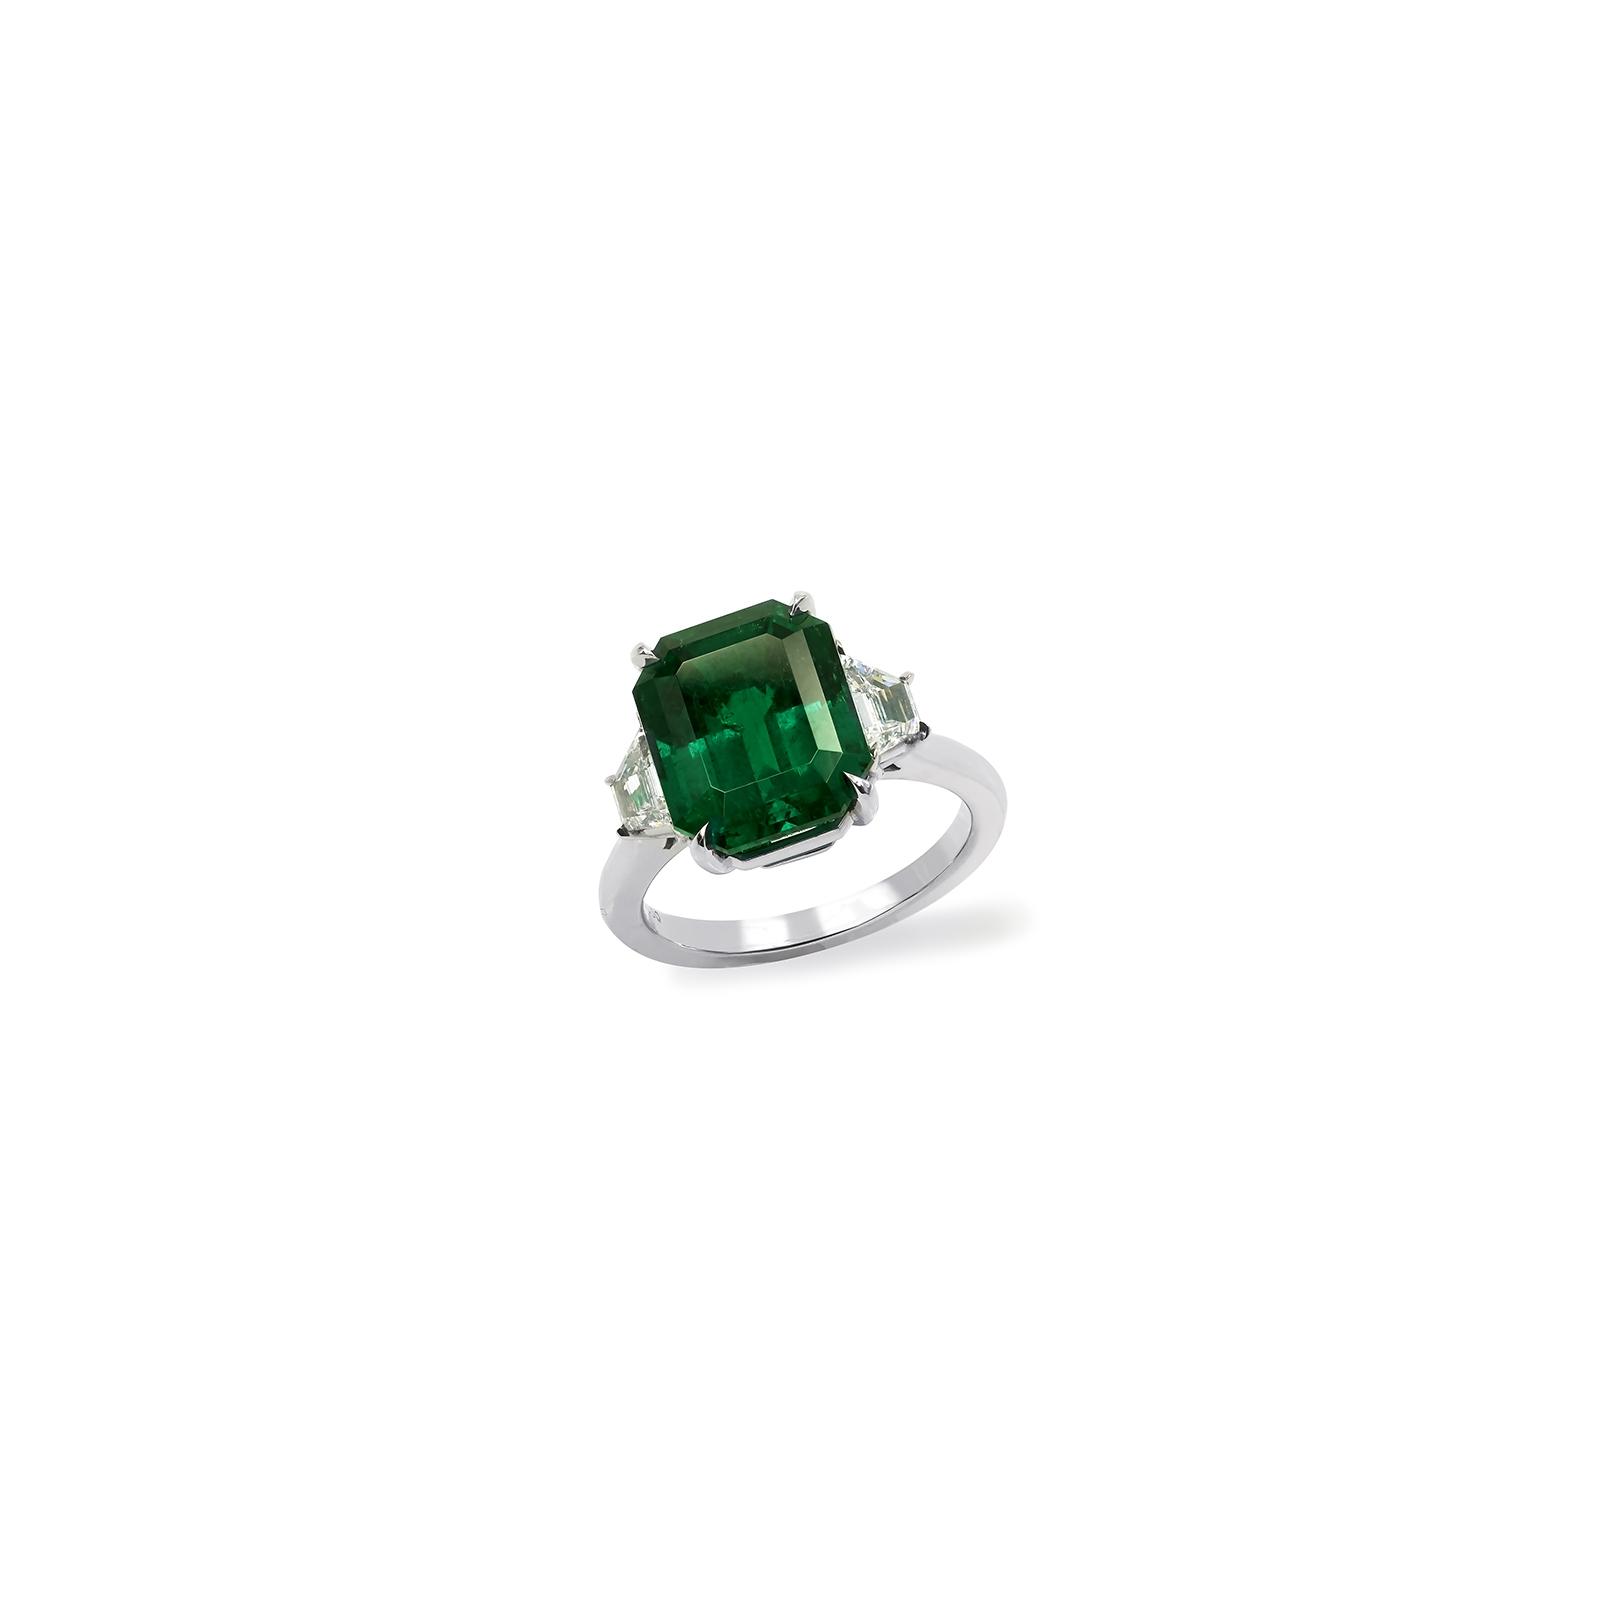 6 carat emerald cut ring